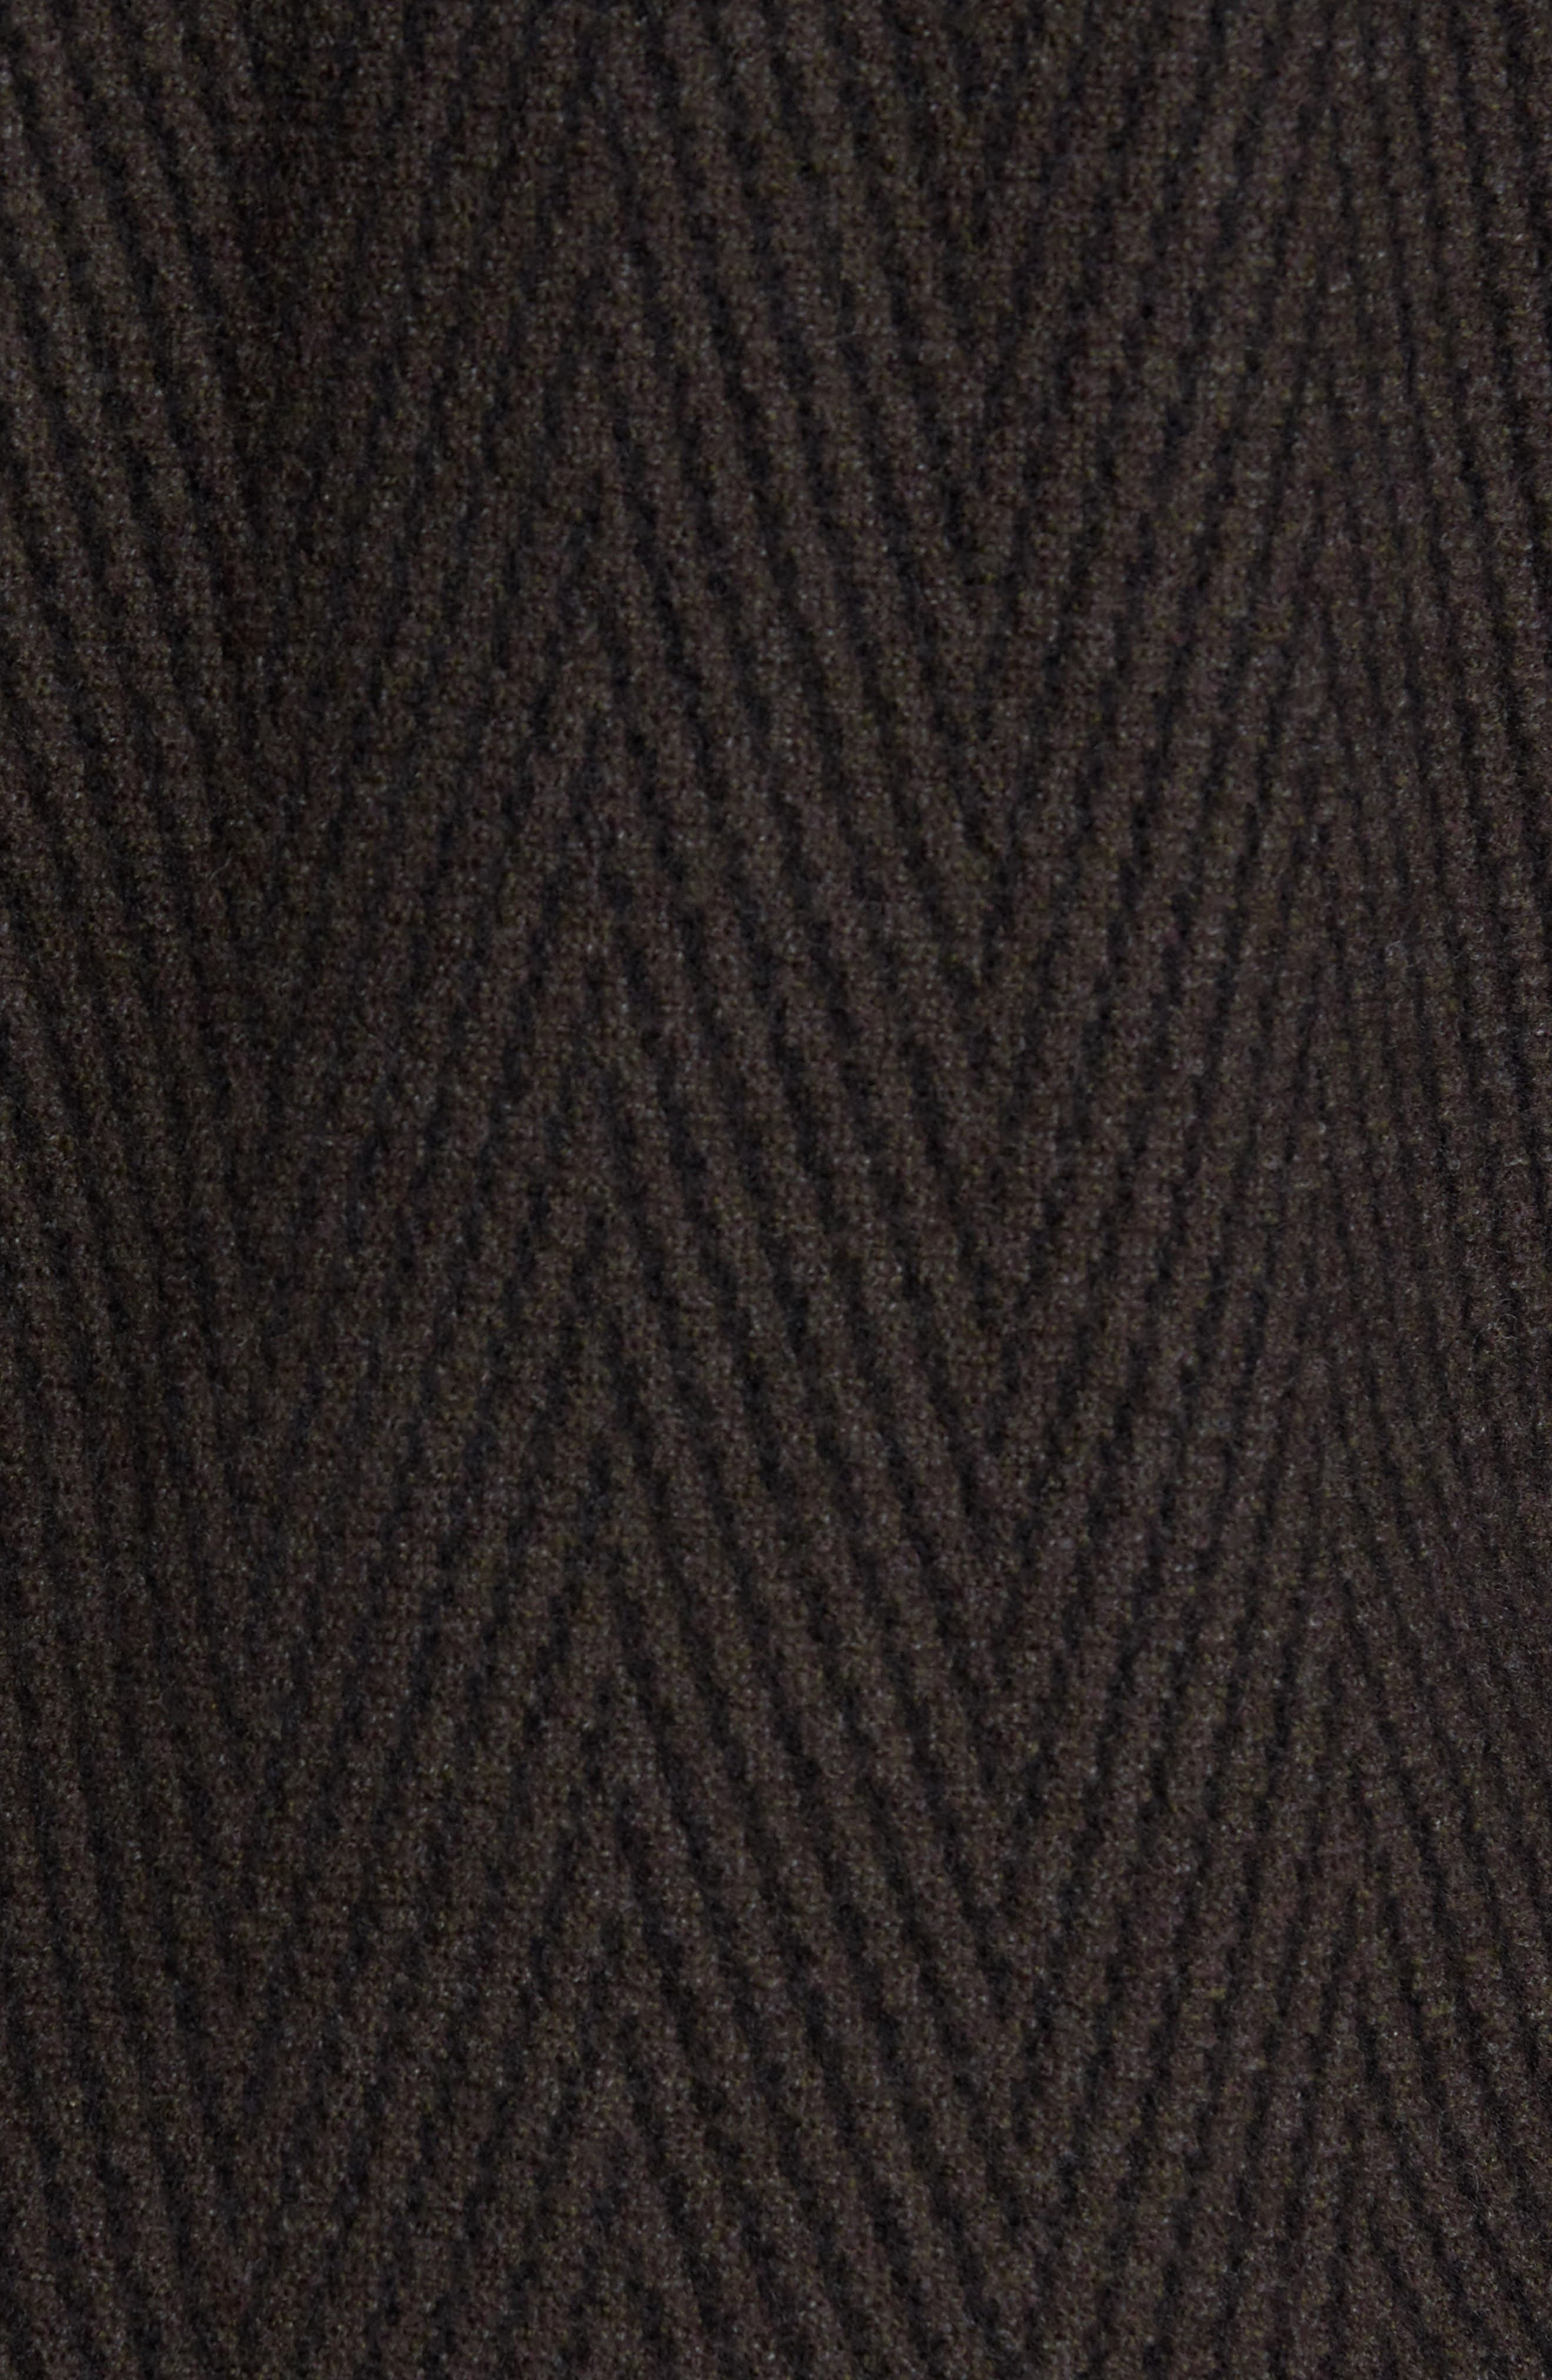 Berger Wool Shirt Jacket,                             Alternate thumbnail 6, color,                             200